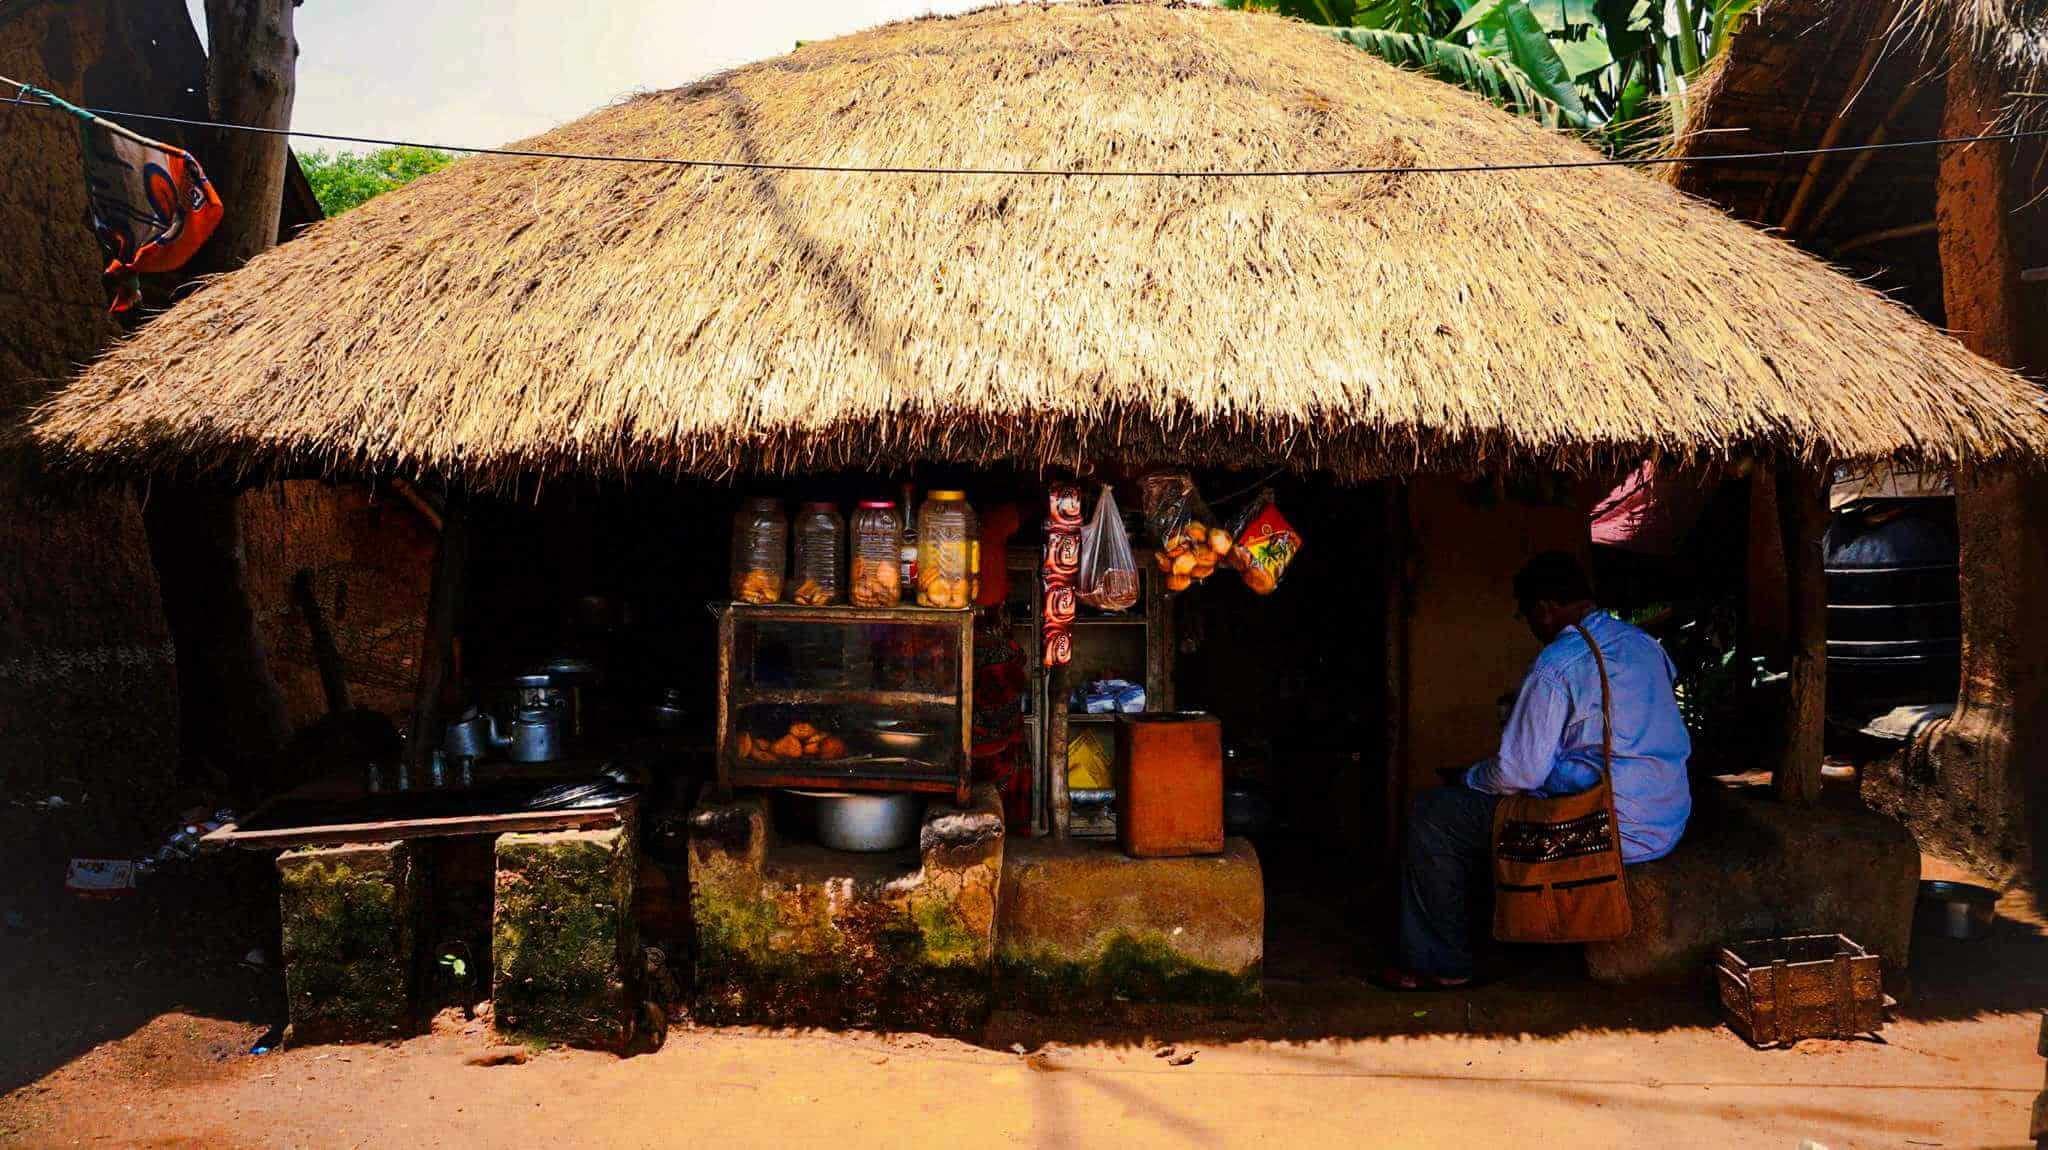 A hut of Rural Bengal